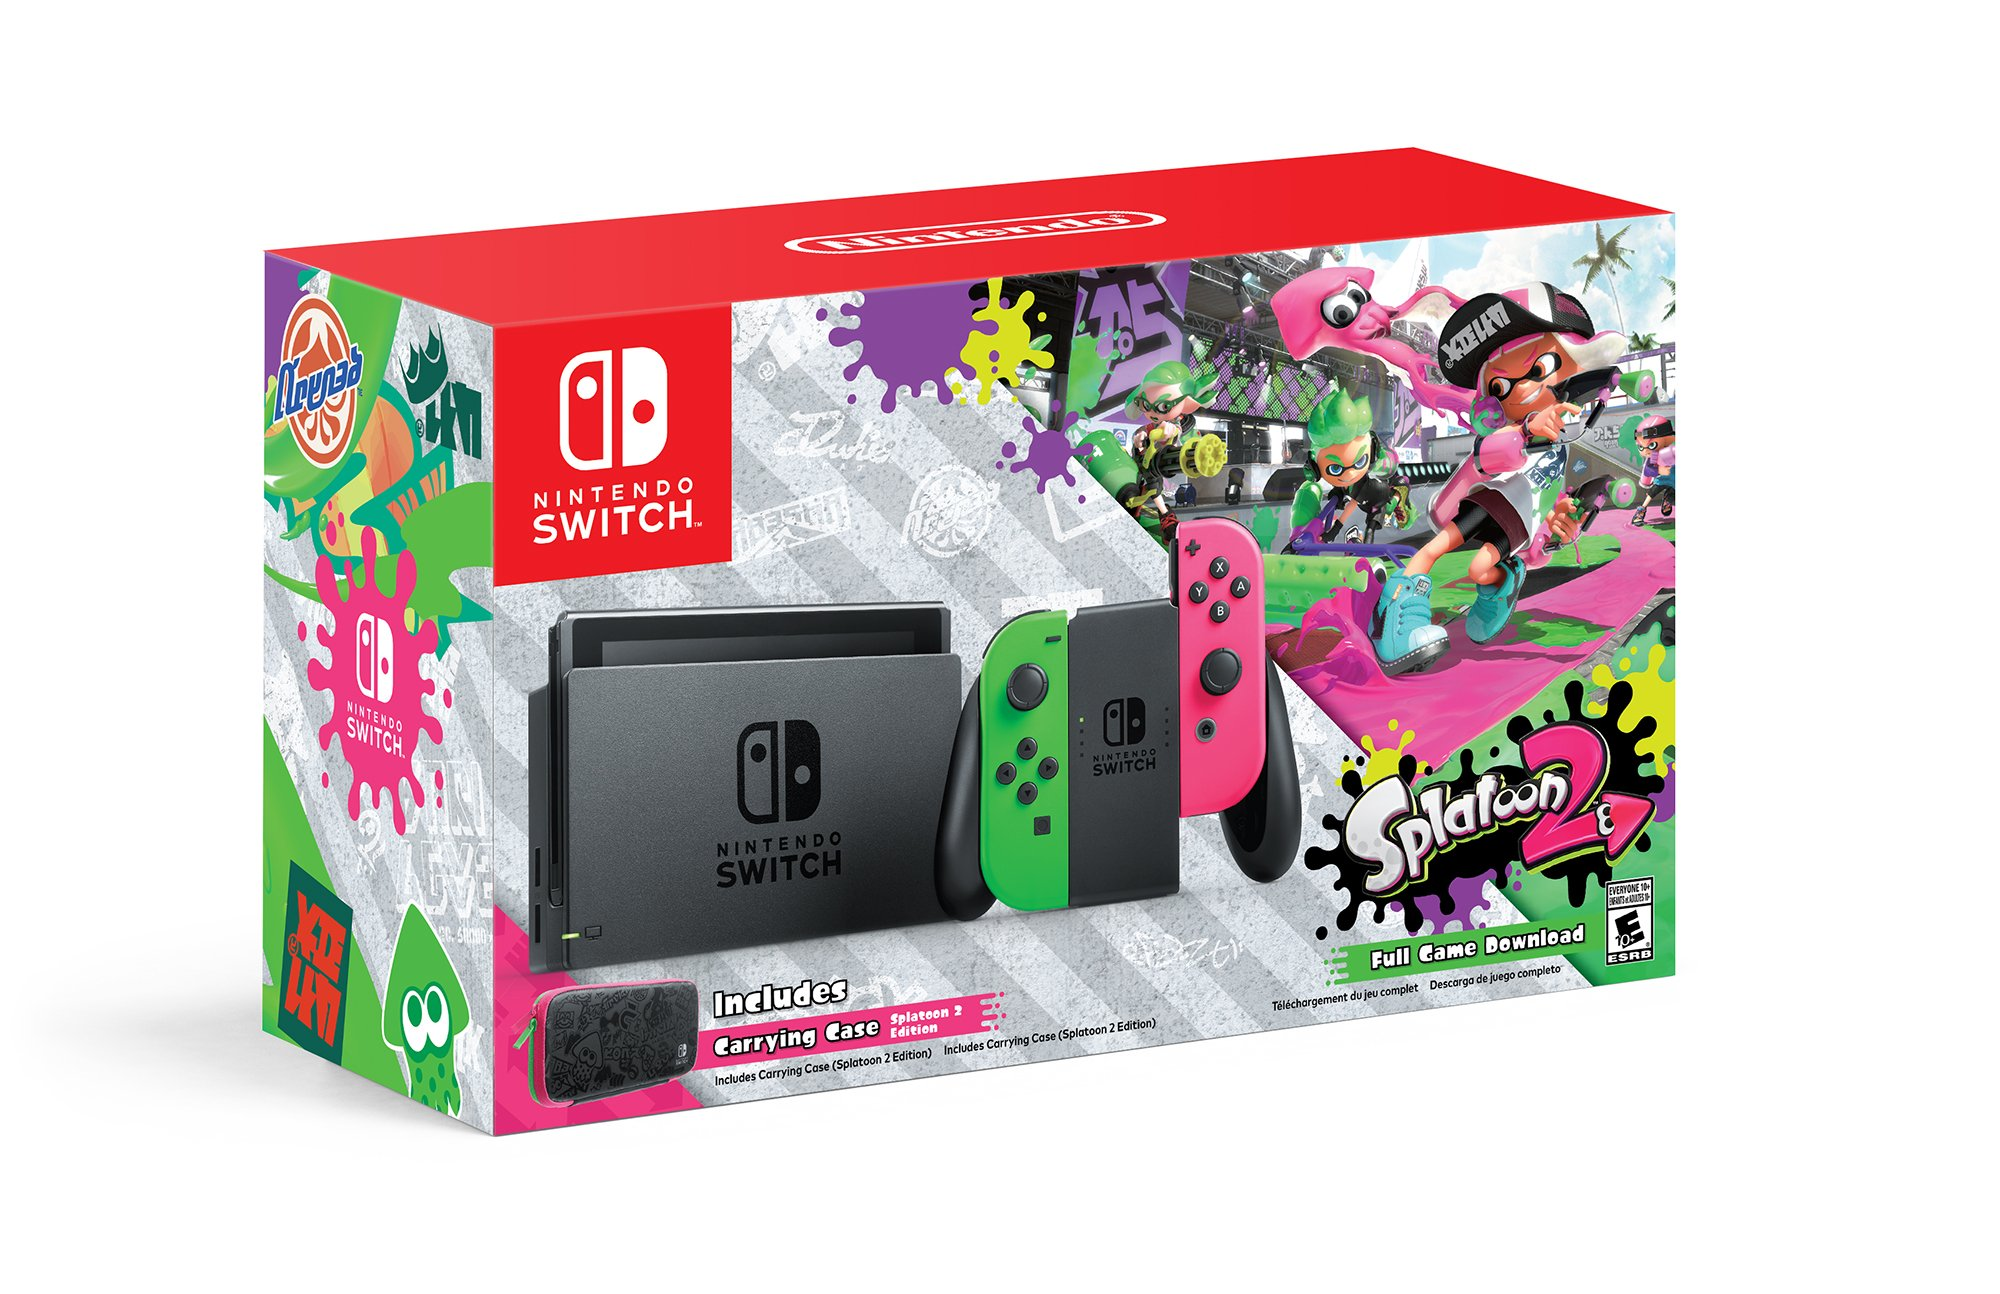 Nintendo Switch Hardware with Splatoon 2 + Neon Green/Neon Pink Joy-Cons (Nintendo Switch) by Nintendo (Image #1)